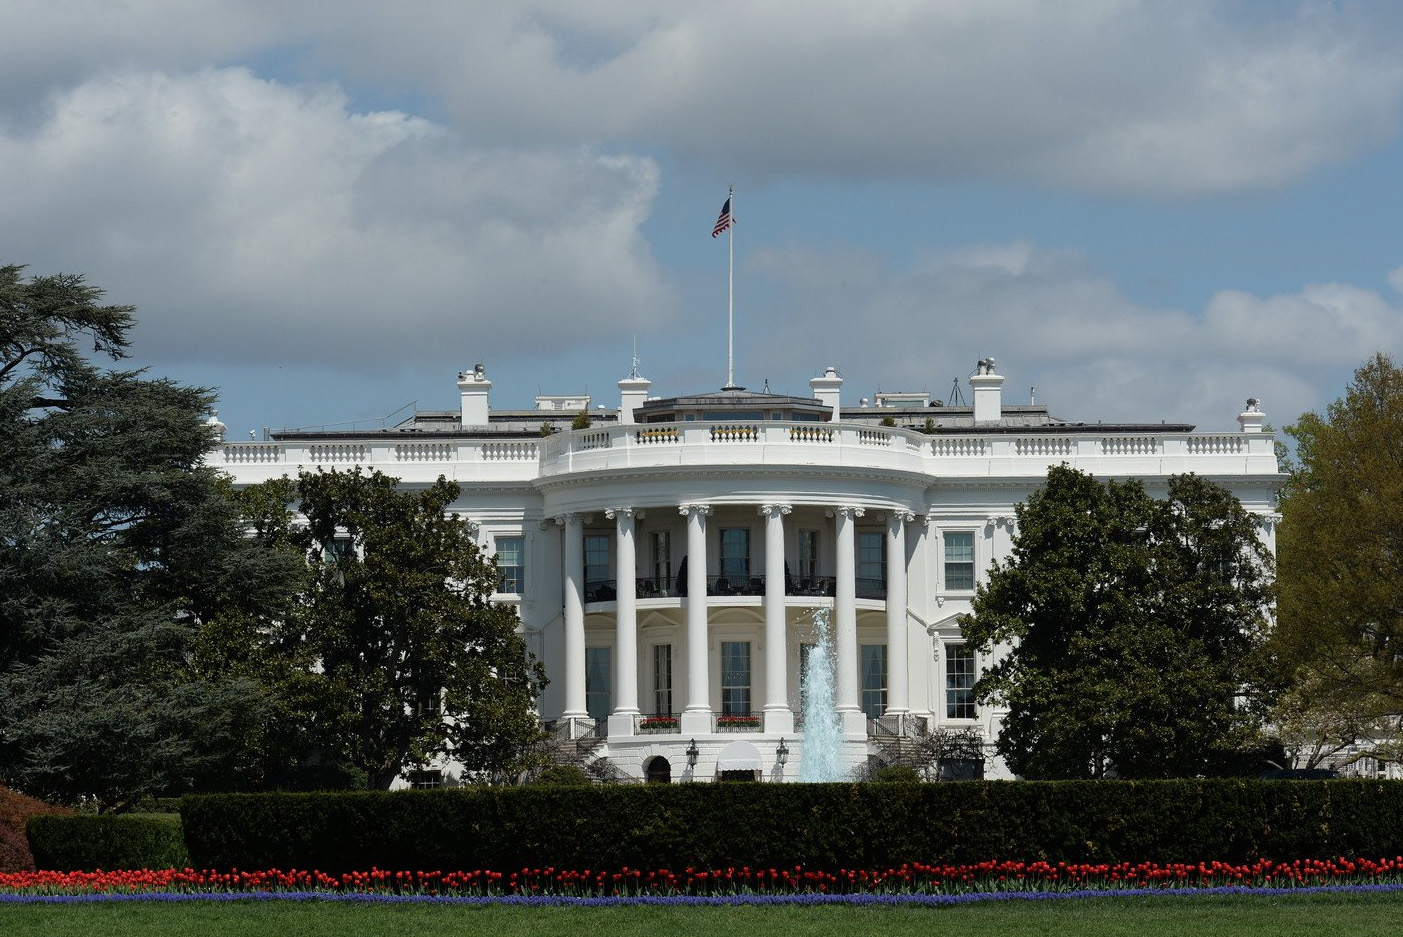 Donald-Trump-Candidat-Maison-Blanche-1